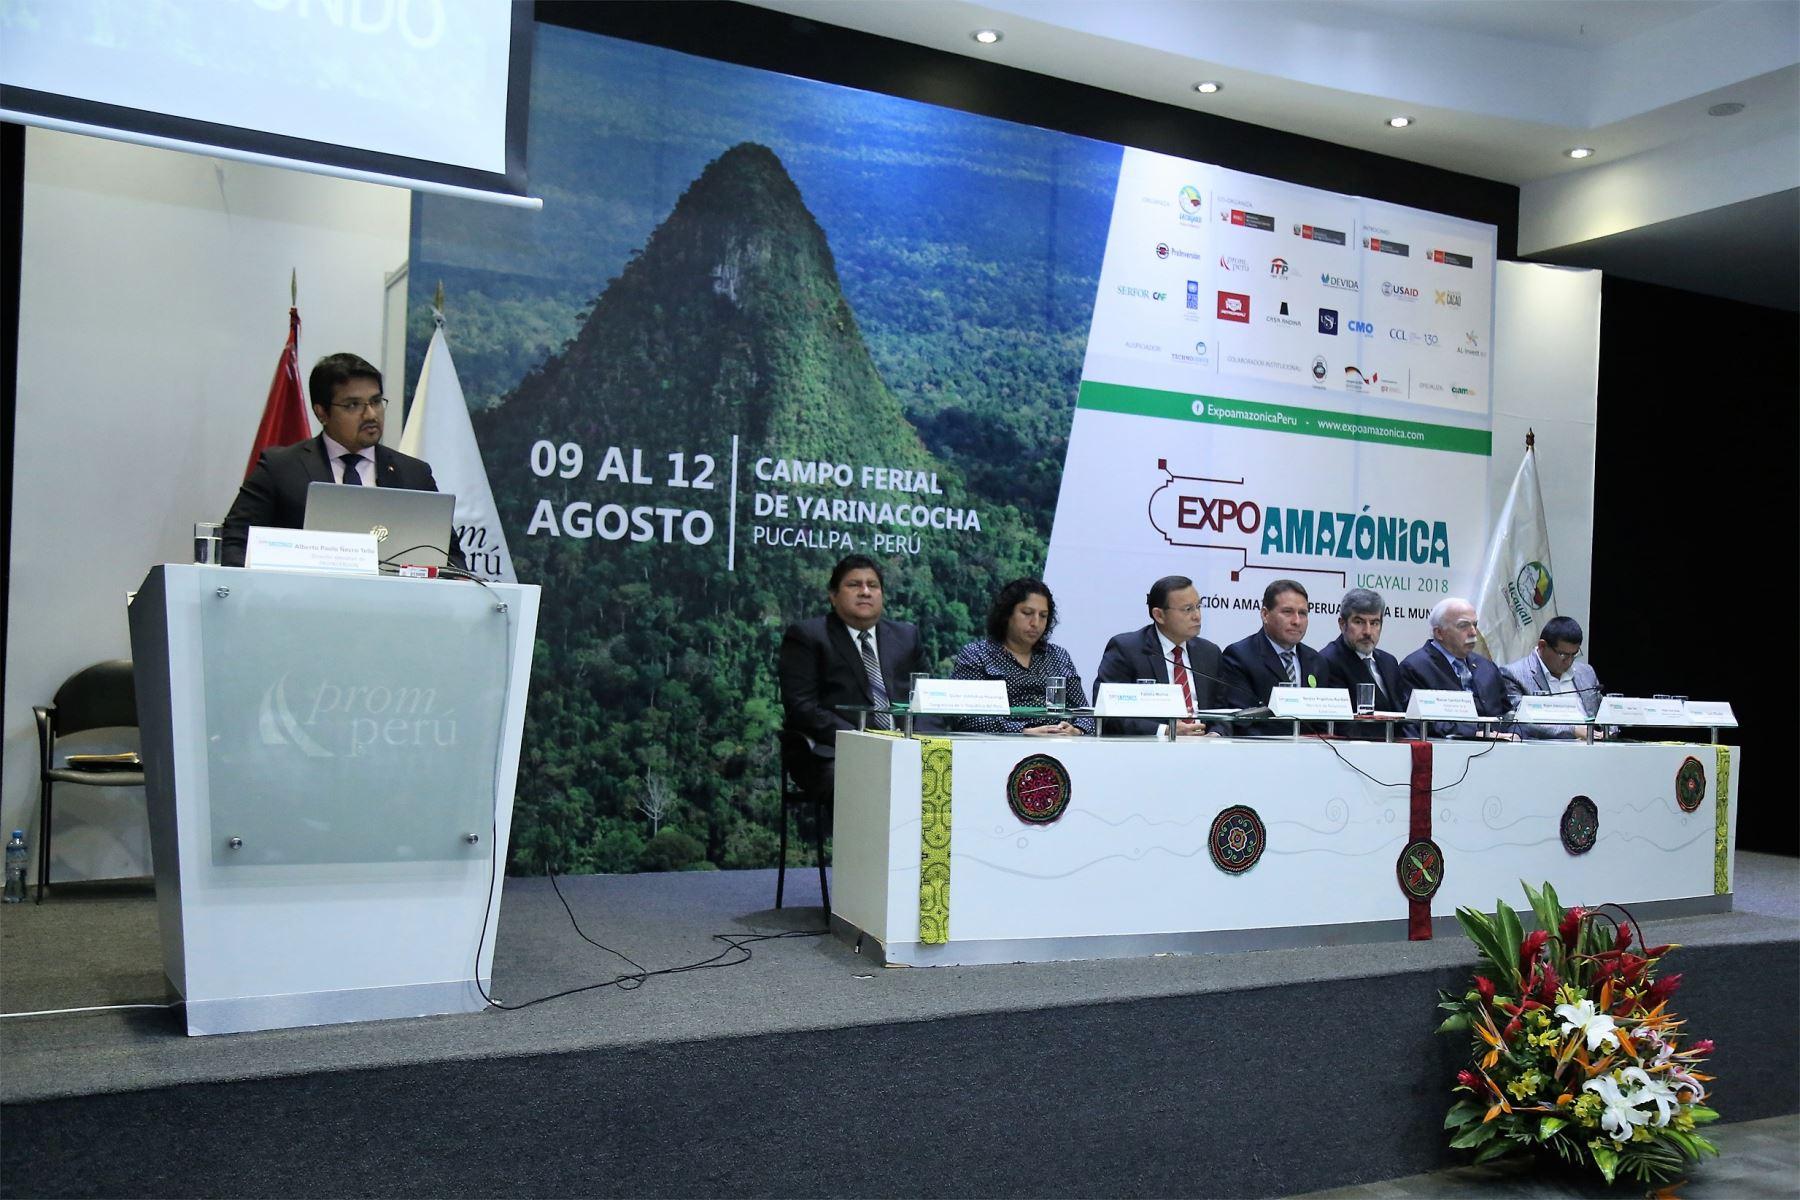 ProInversión promoverá las potencialidades de inversión de la selva en ExpoAmazónica. ANDINA/Difusión